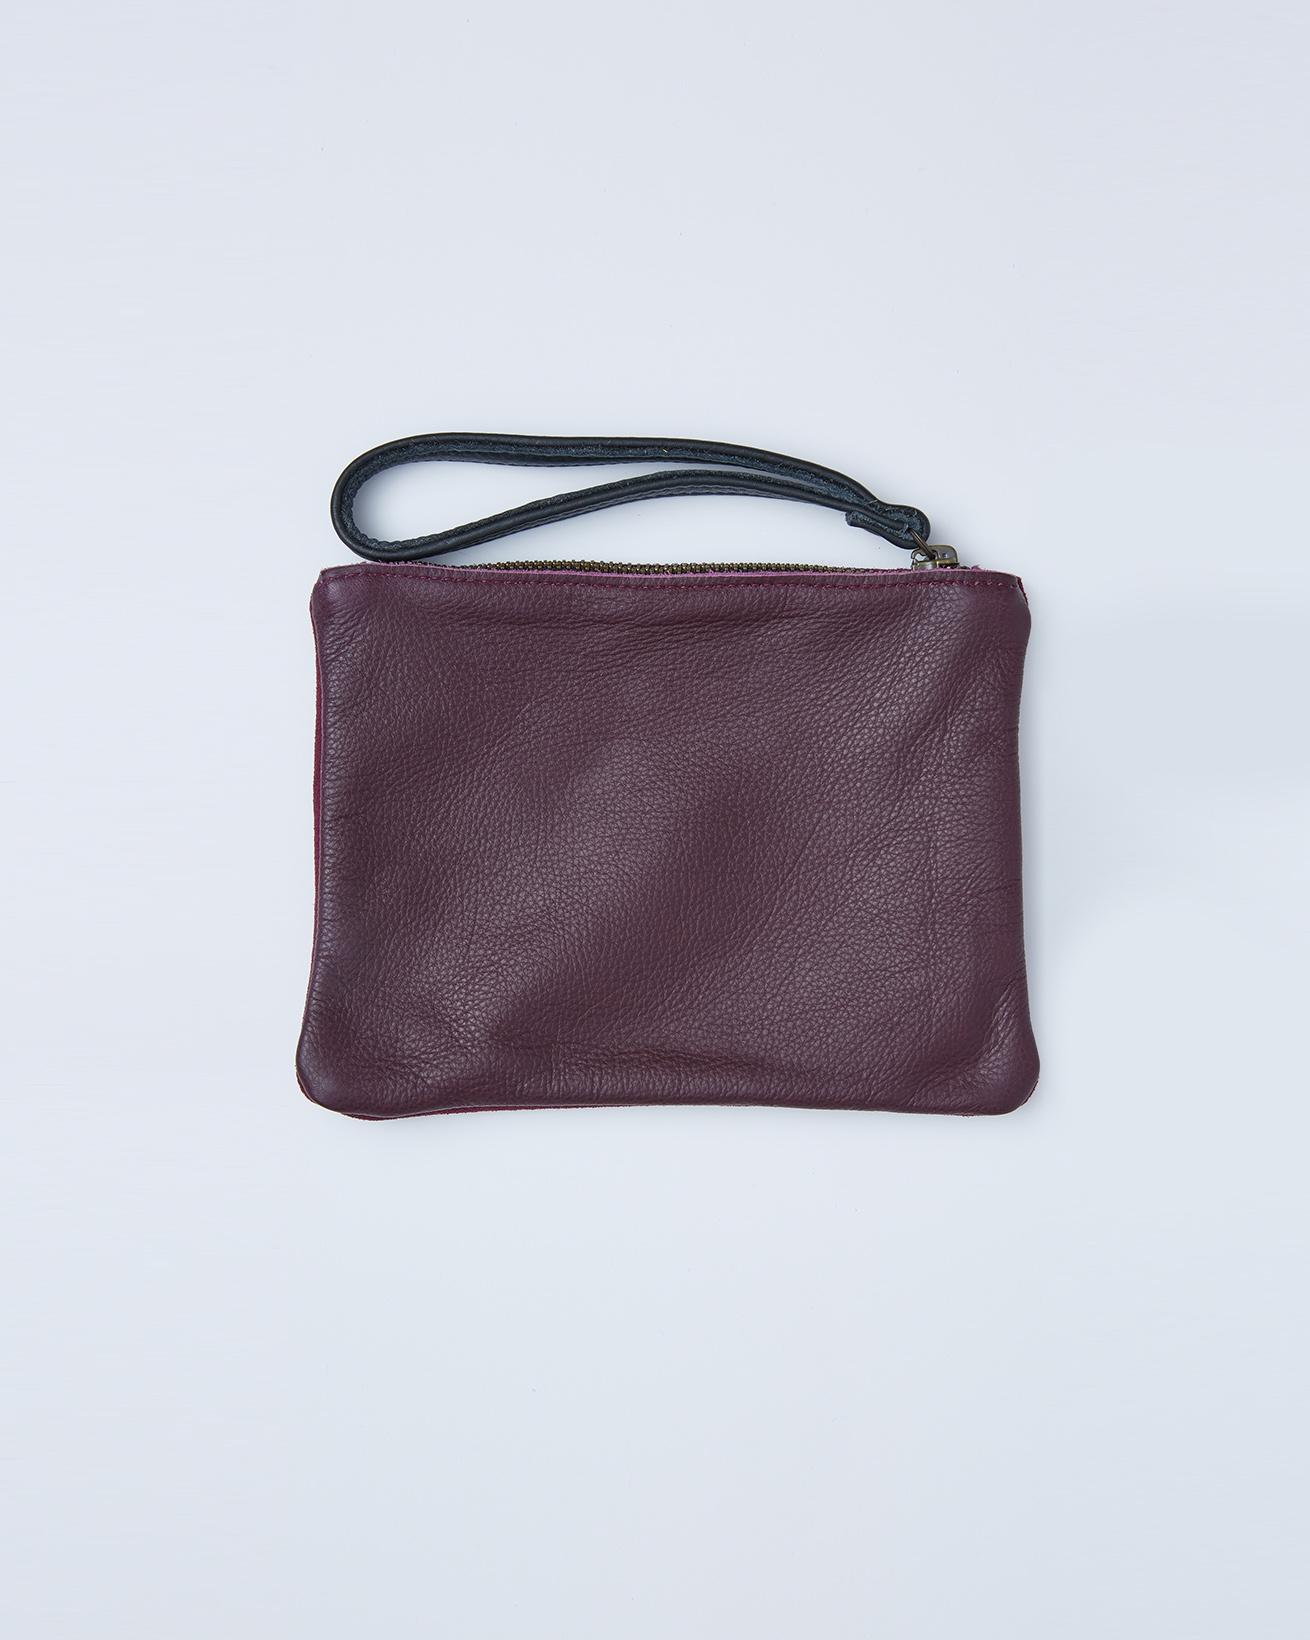 Small Clutch Bag Tidy - One/Size - Damson - 2417